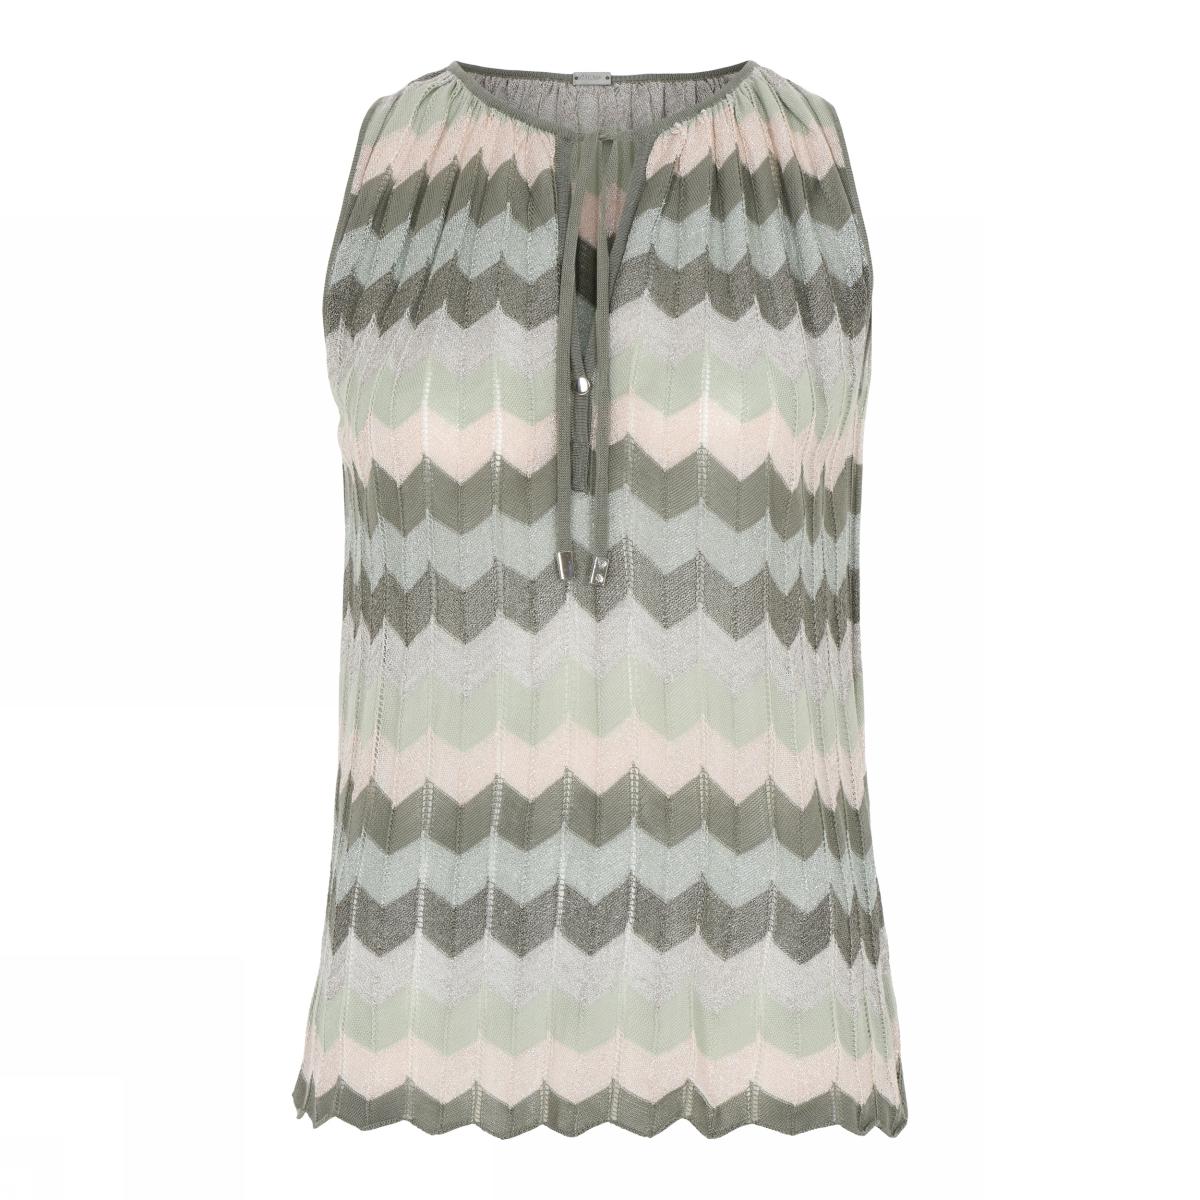 Dames top Gustav Jayla knit halter neck   41401-3537-0-83018